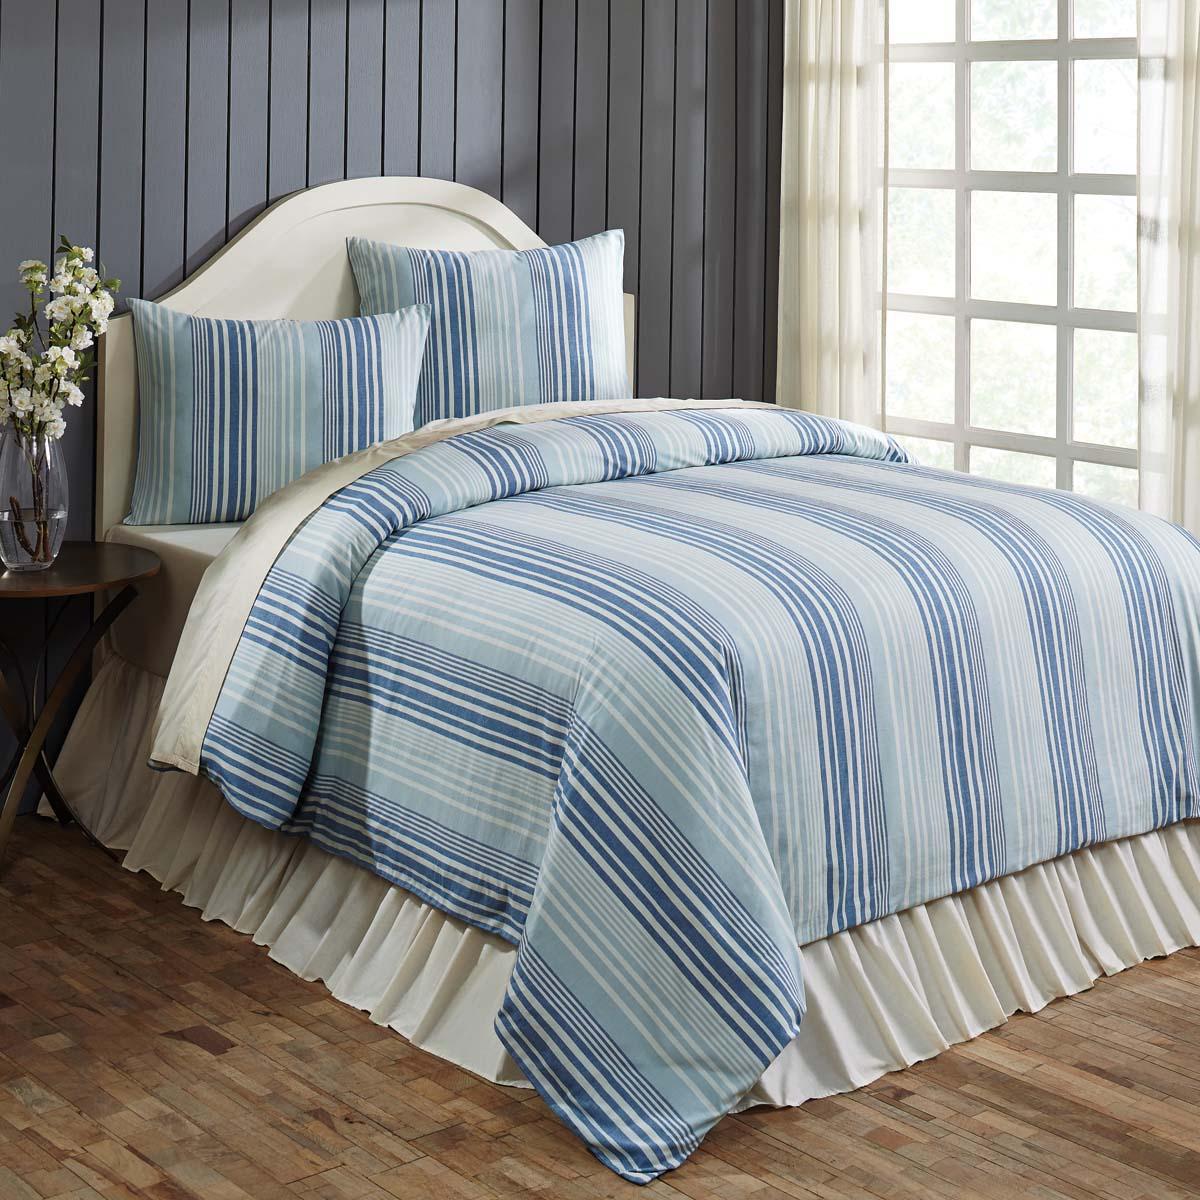 Blue Farmhouse Bedding Coastal Two Tone Stripe Cotton Tie Back S Striped Queen Duvet Cover Walmart Com Walmart Com